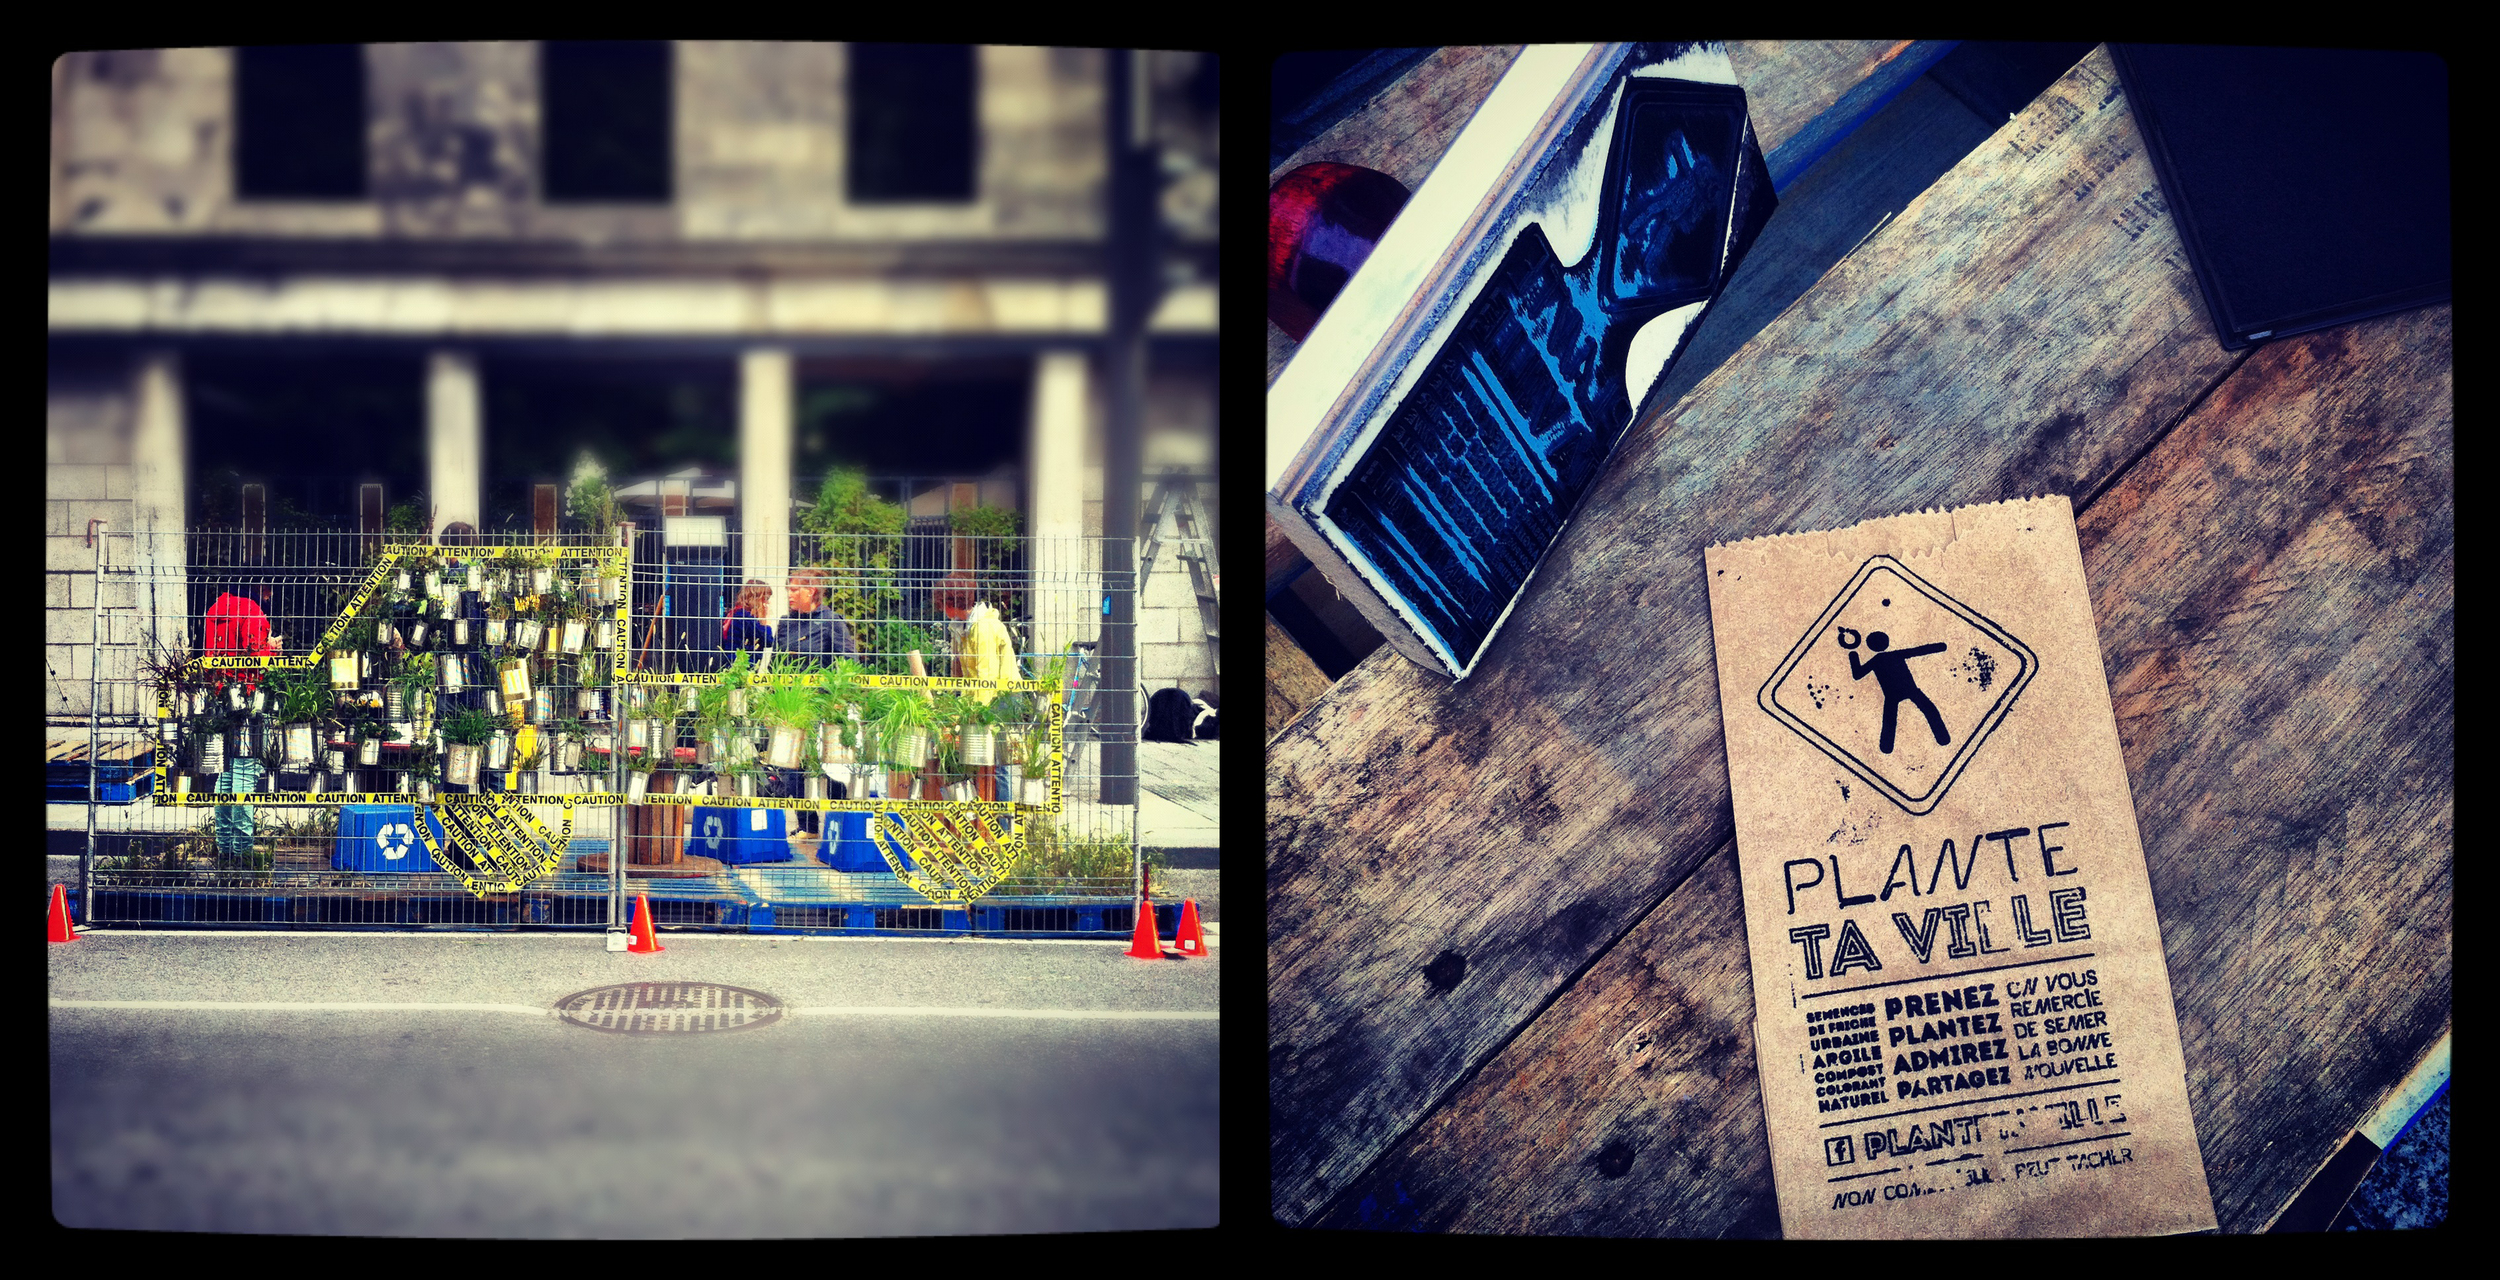 ⓒ Plante ta ville